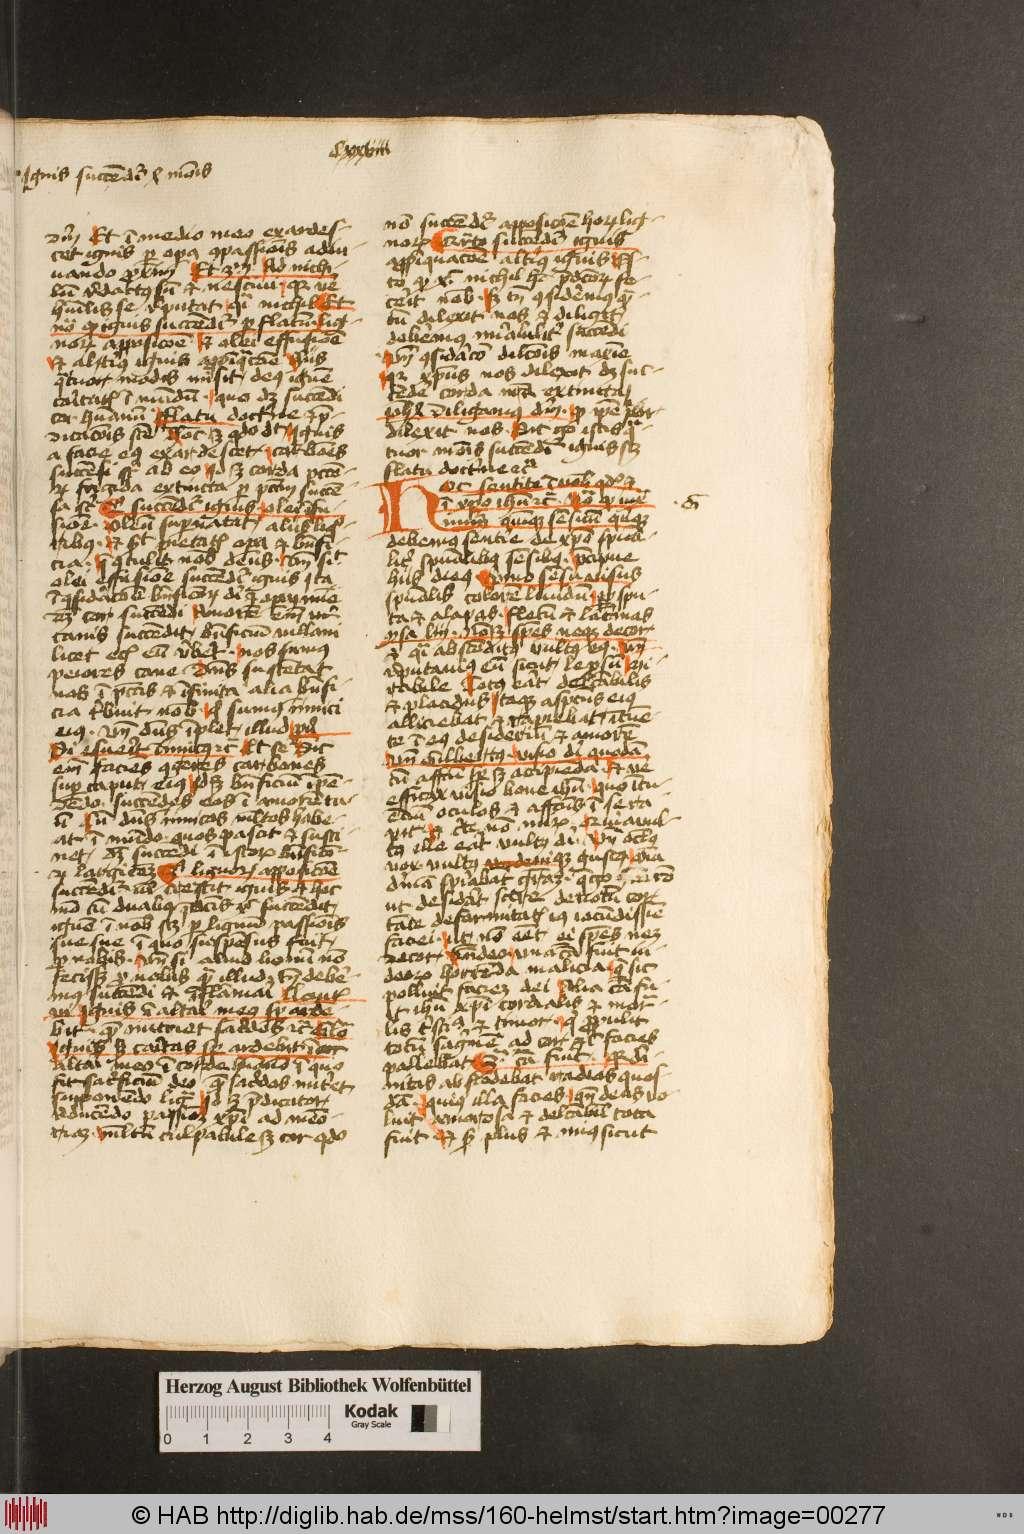 http://diglib.hab.de/mss/160-helmst/00277.jpg